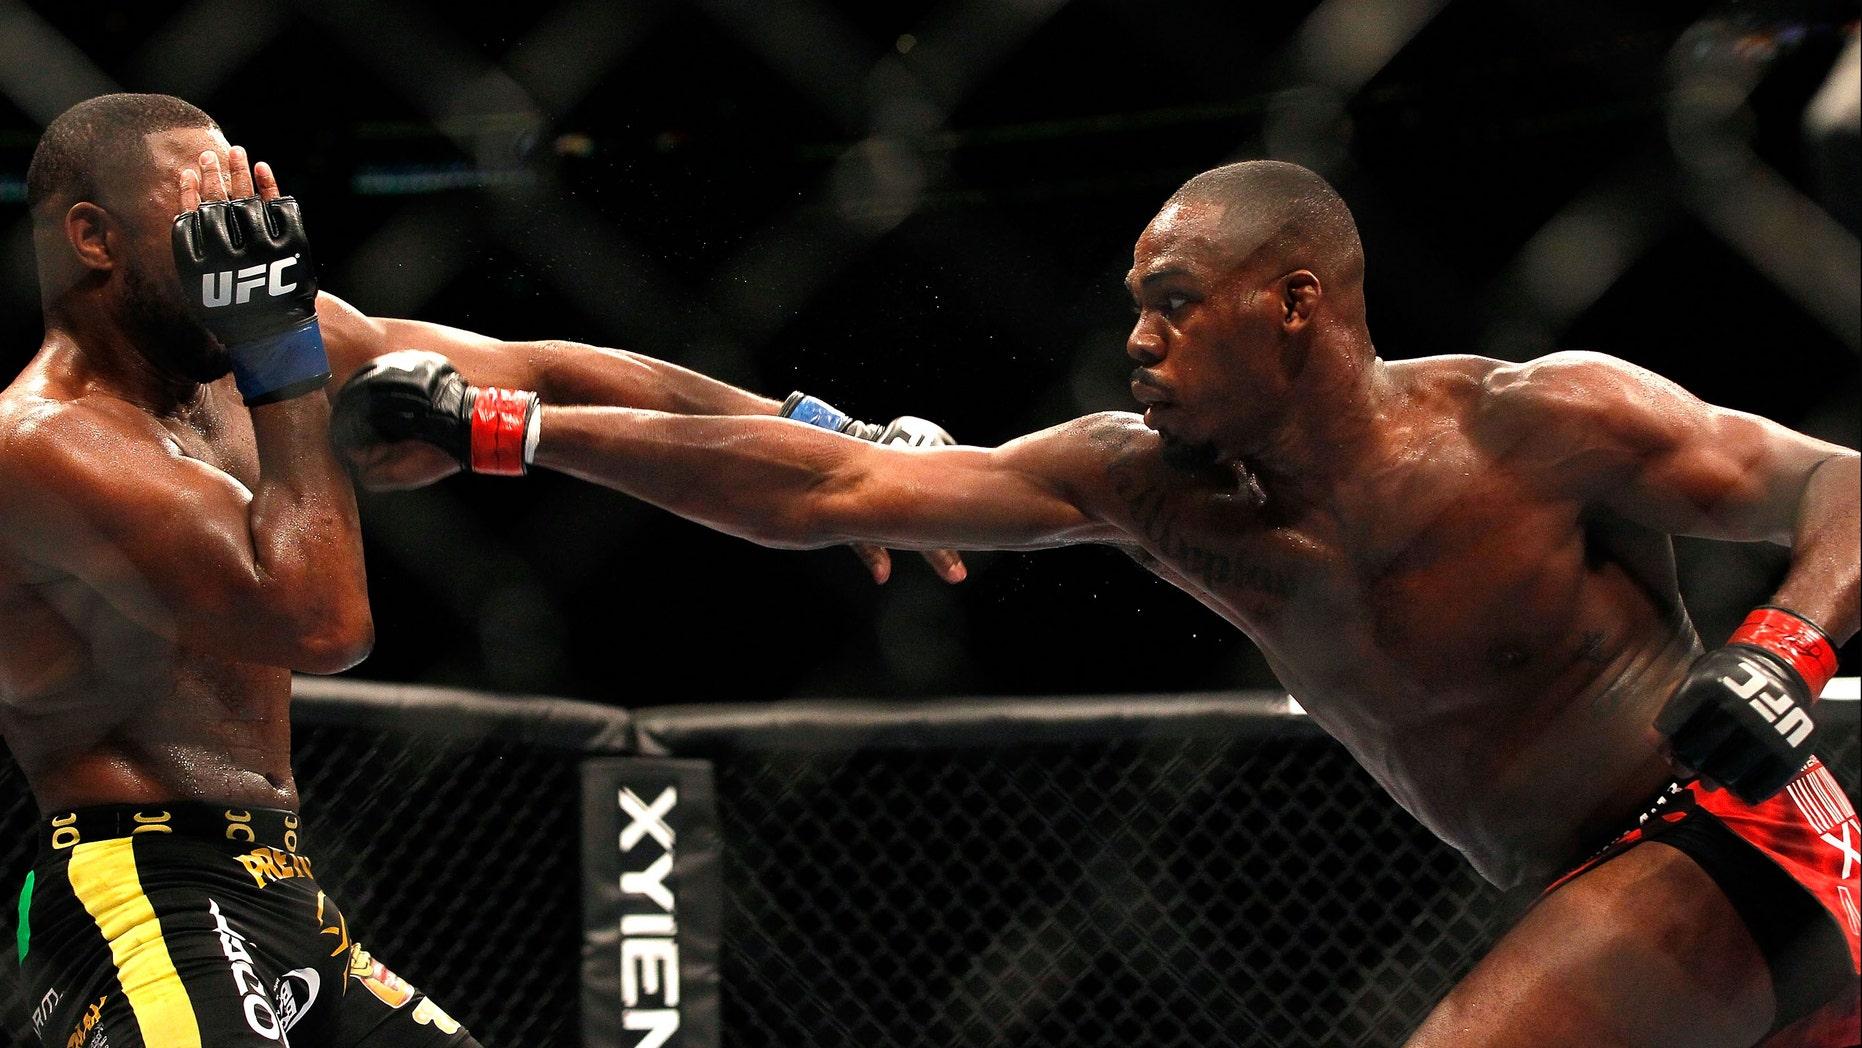 UFC: Jon Jones Vs  Chael Sonnen, Could There Be An Upset